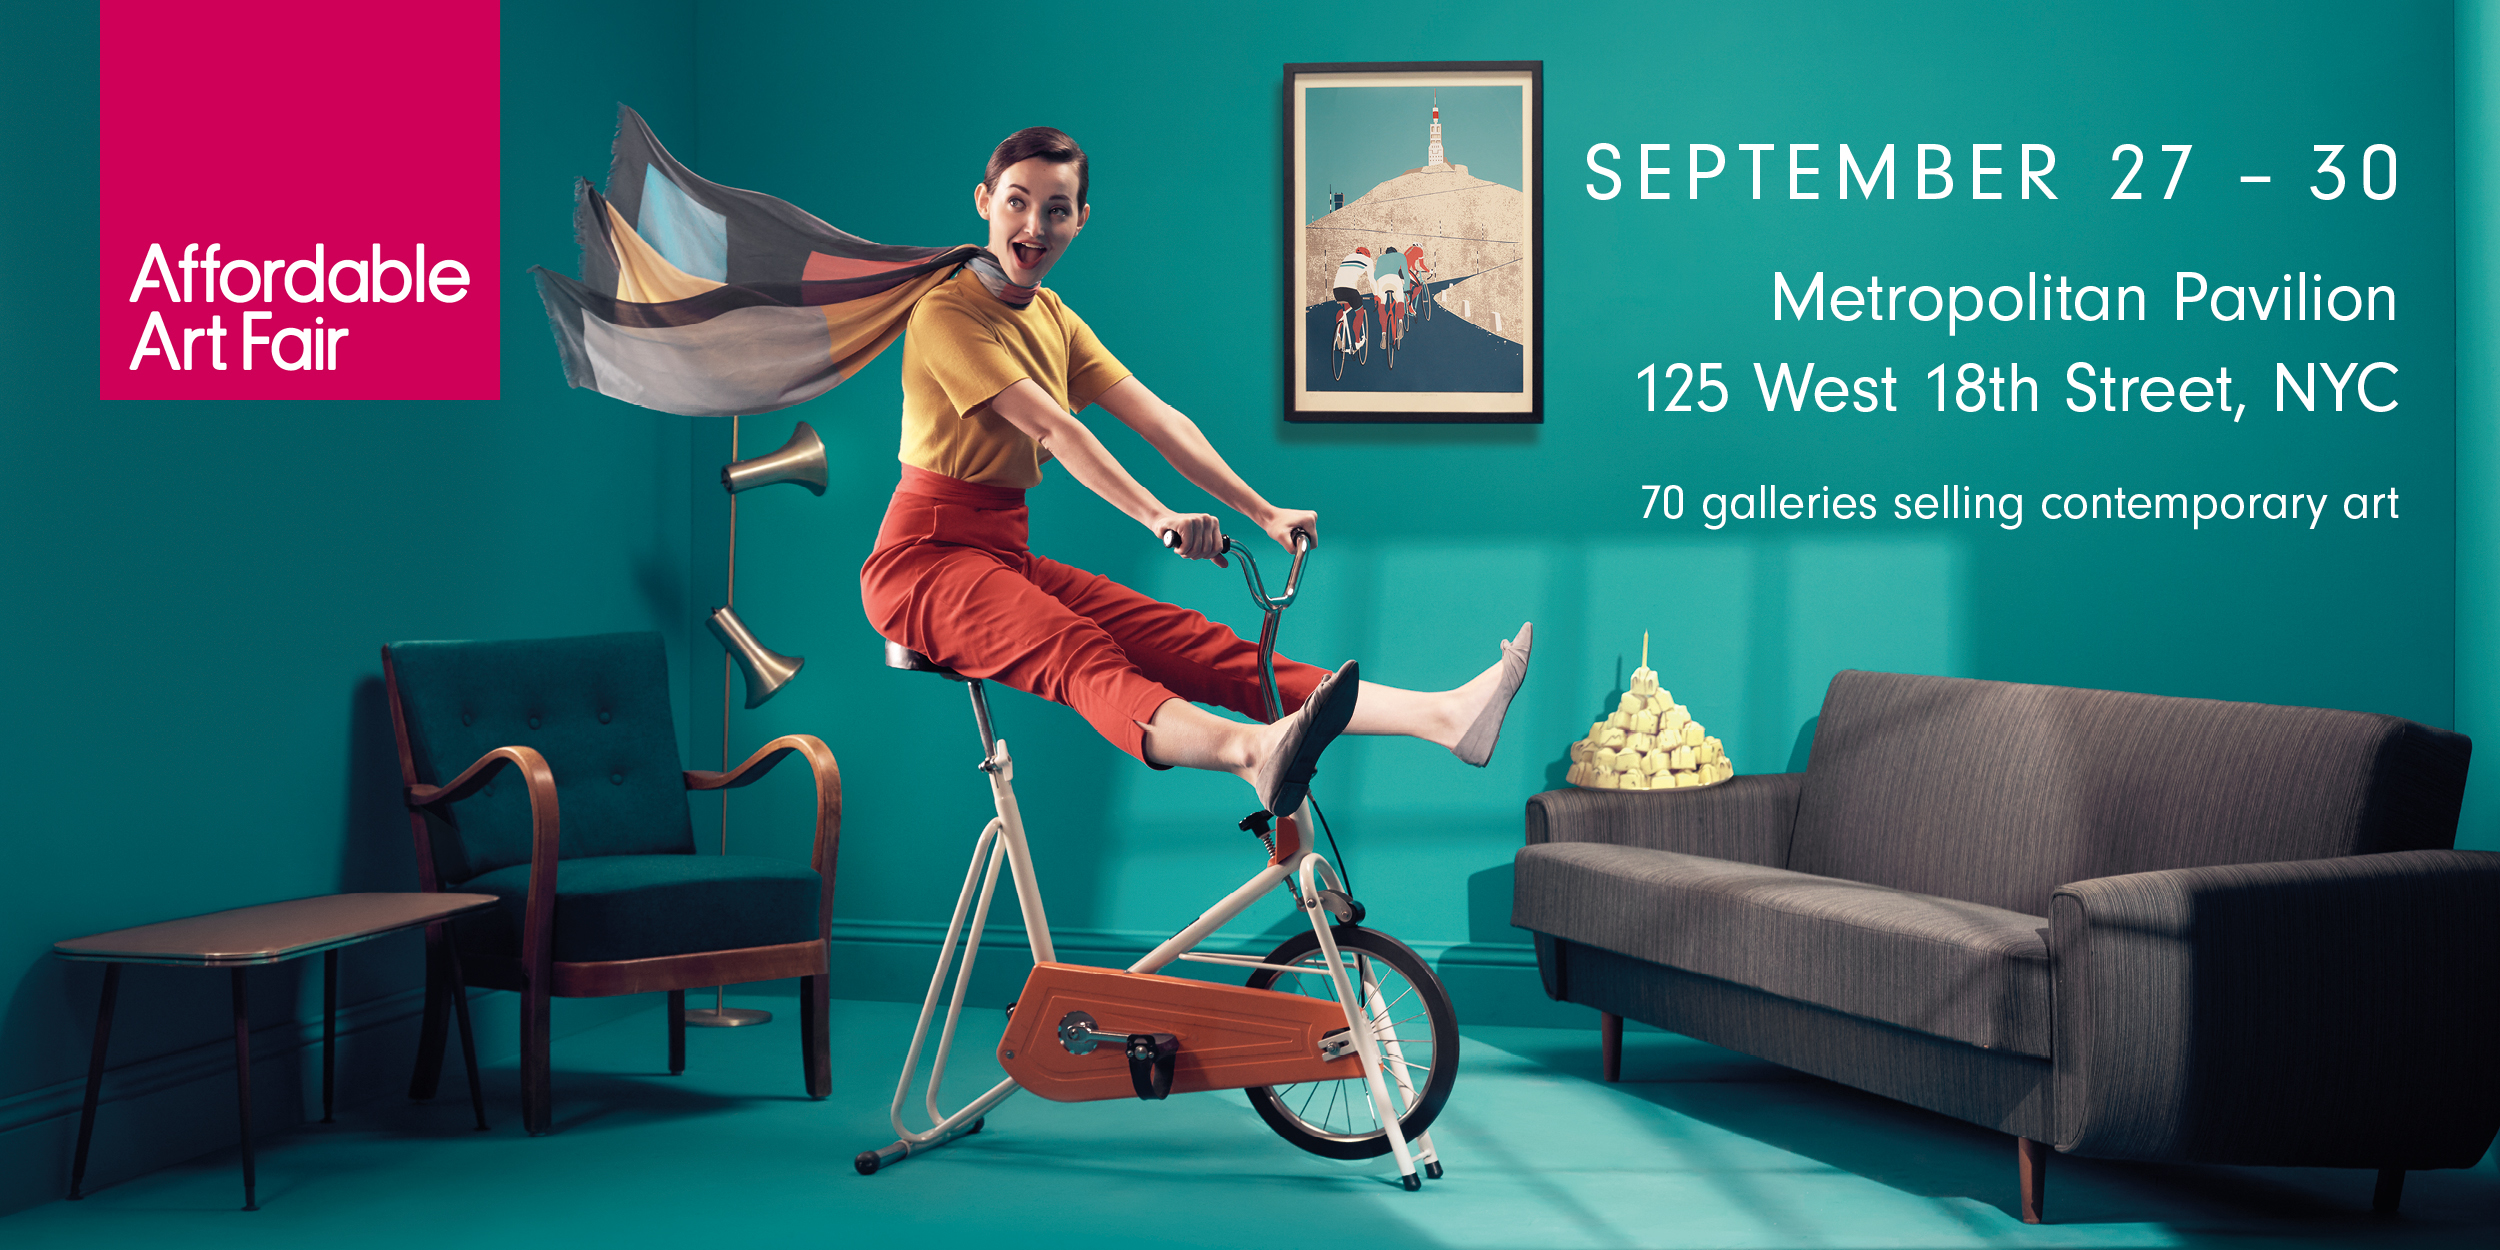 Venderbosch Gallery at Affordable Art Fair New York September 26 – 30